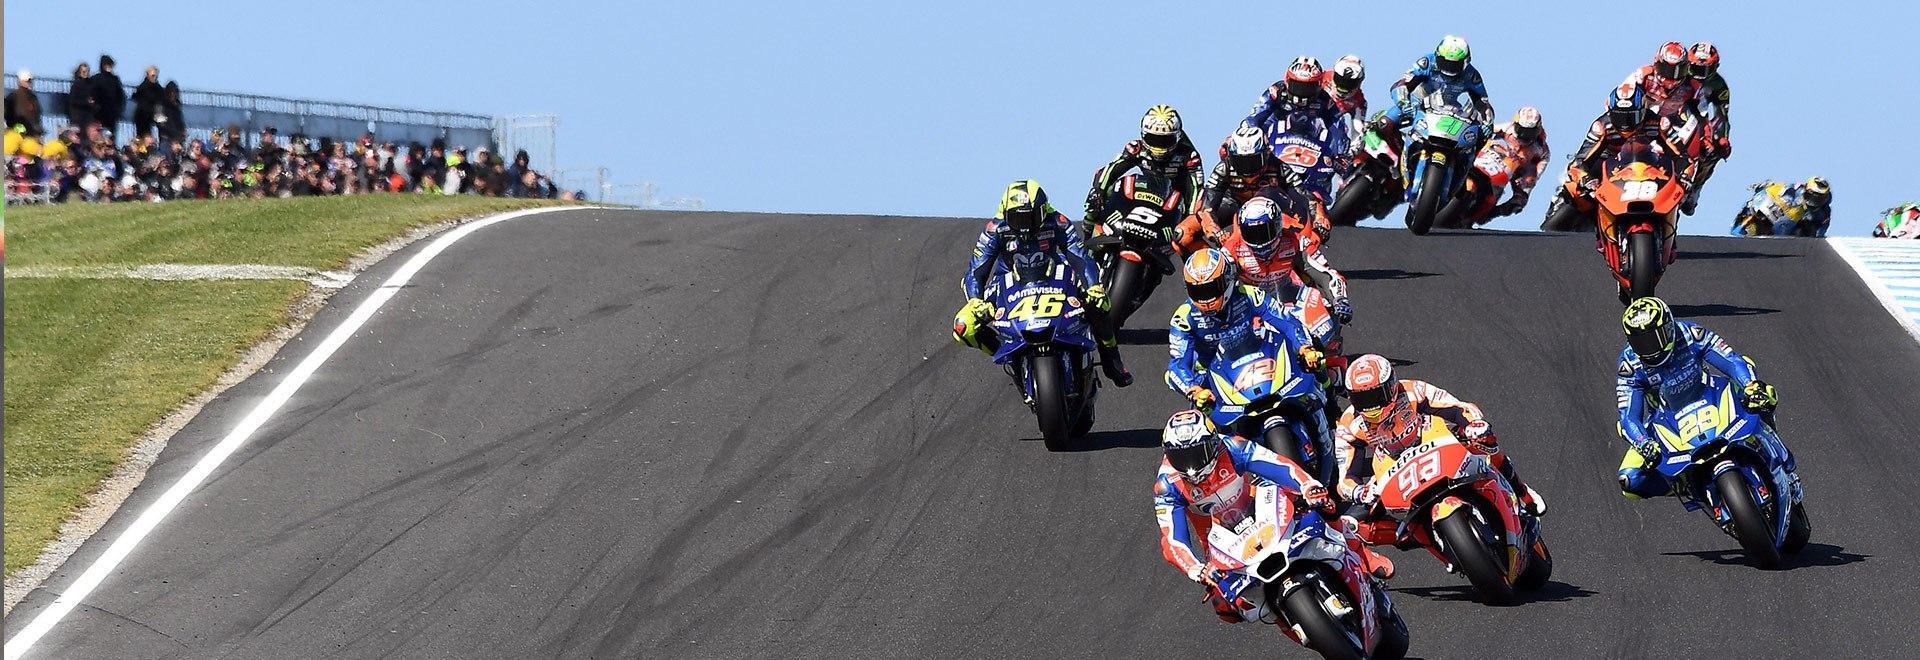 GP Catalunya